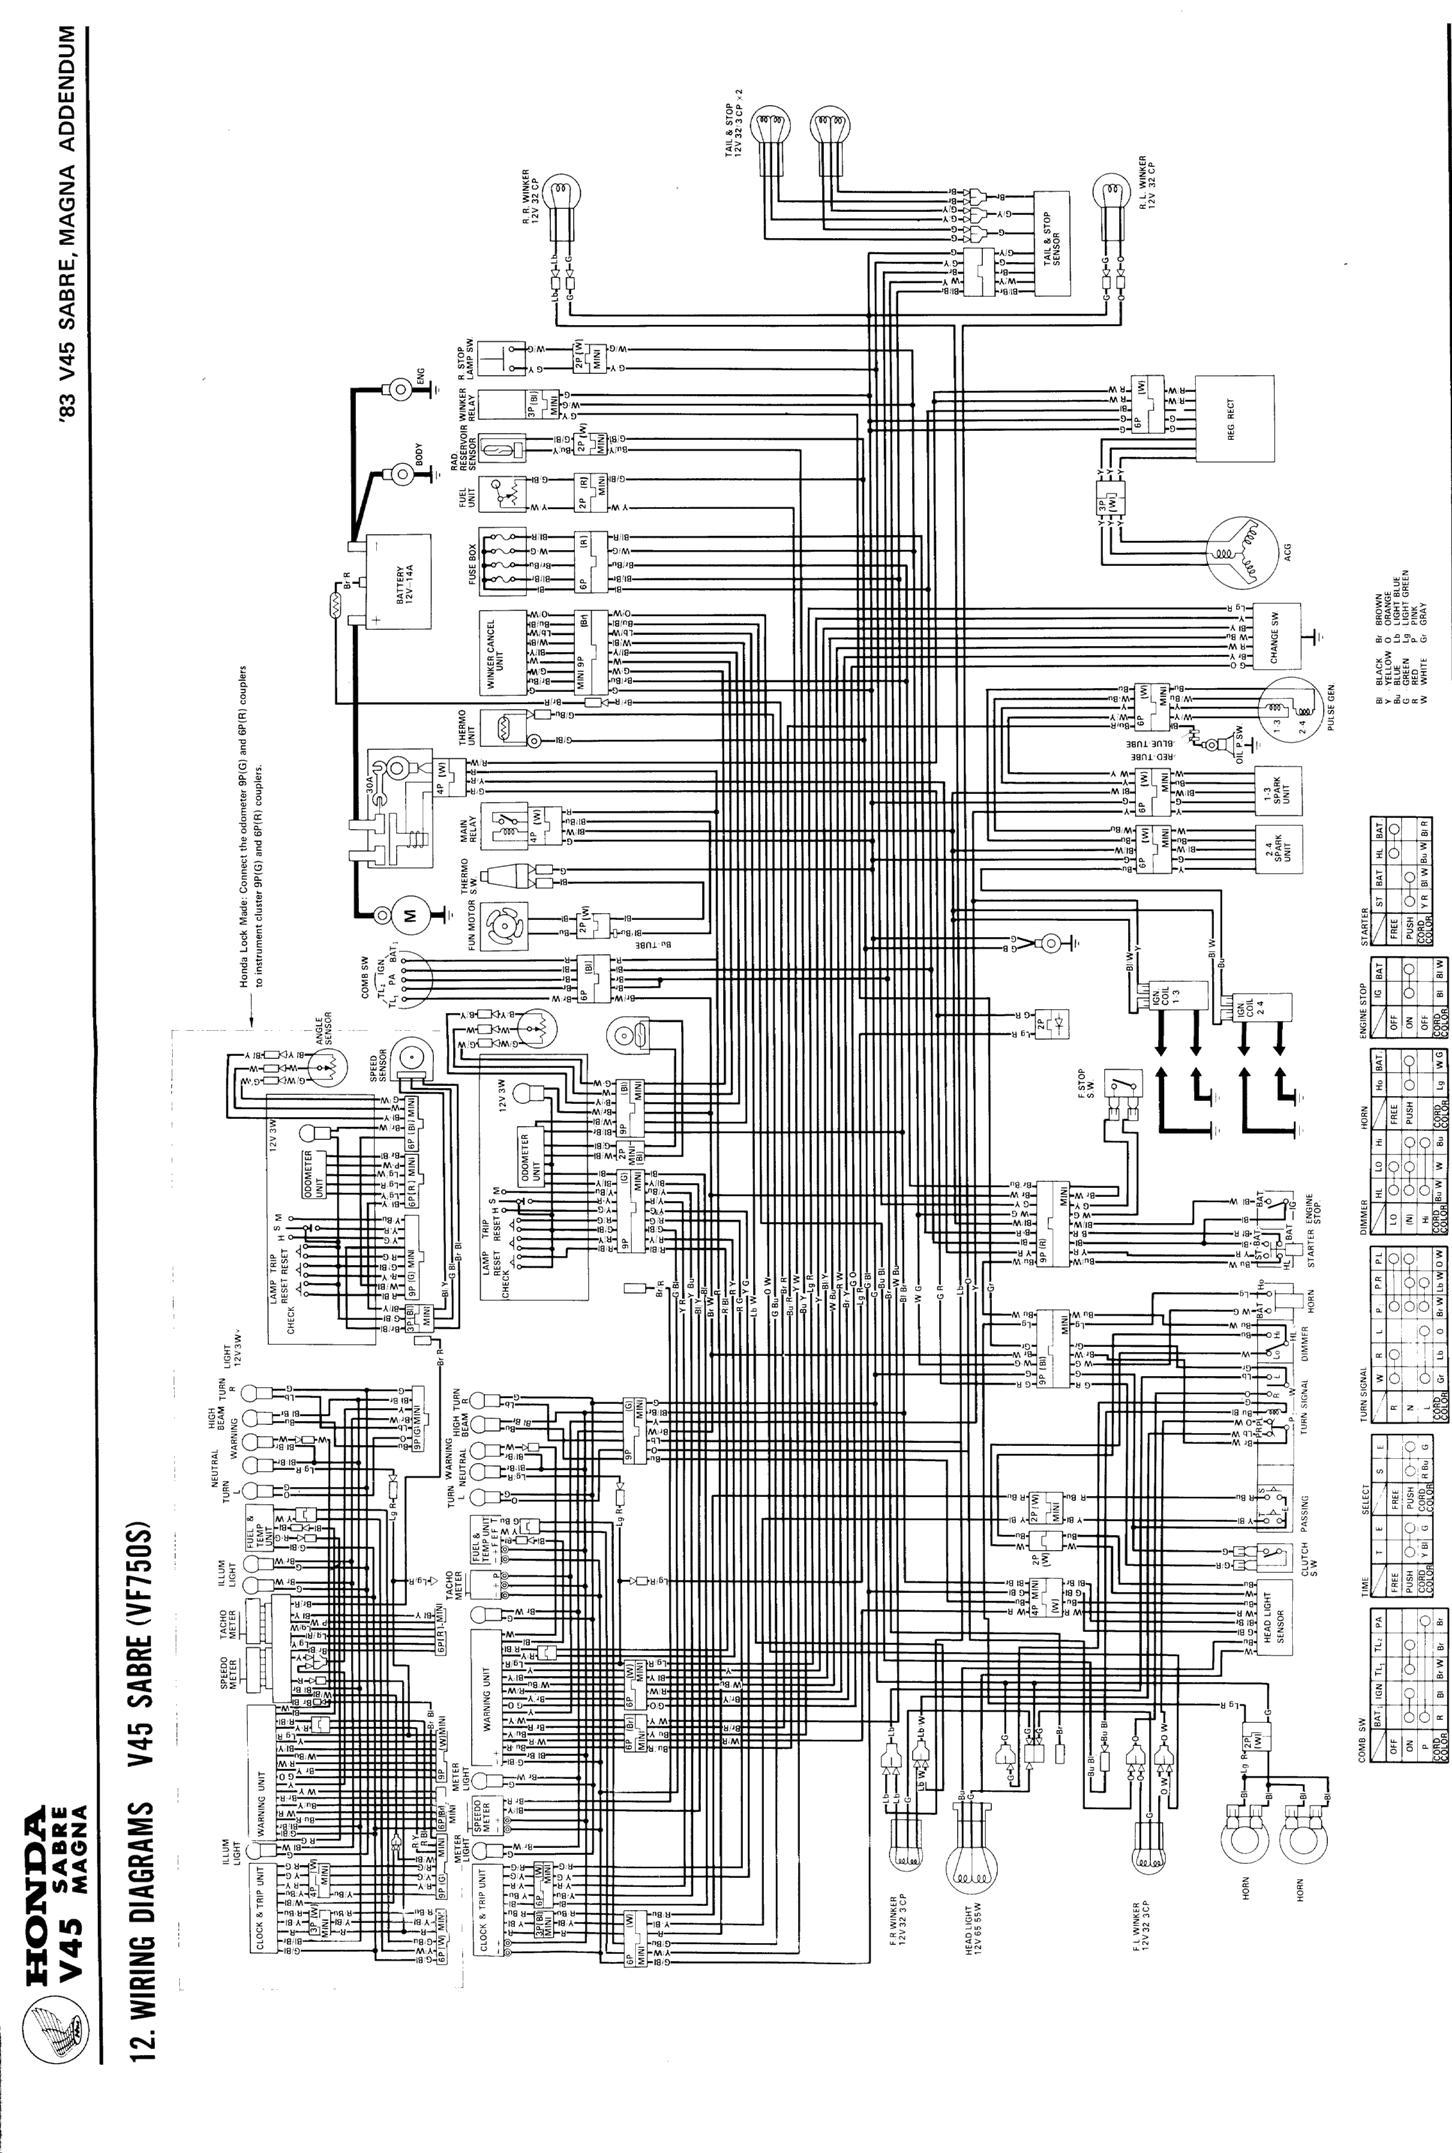 john deere sabre 1438gs wiring diagram of automotive ignition system 1438 image medium resolution bass end ackwards honda v45